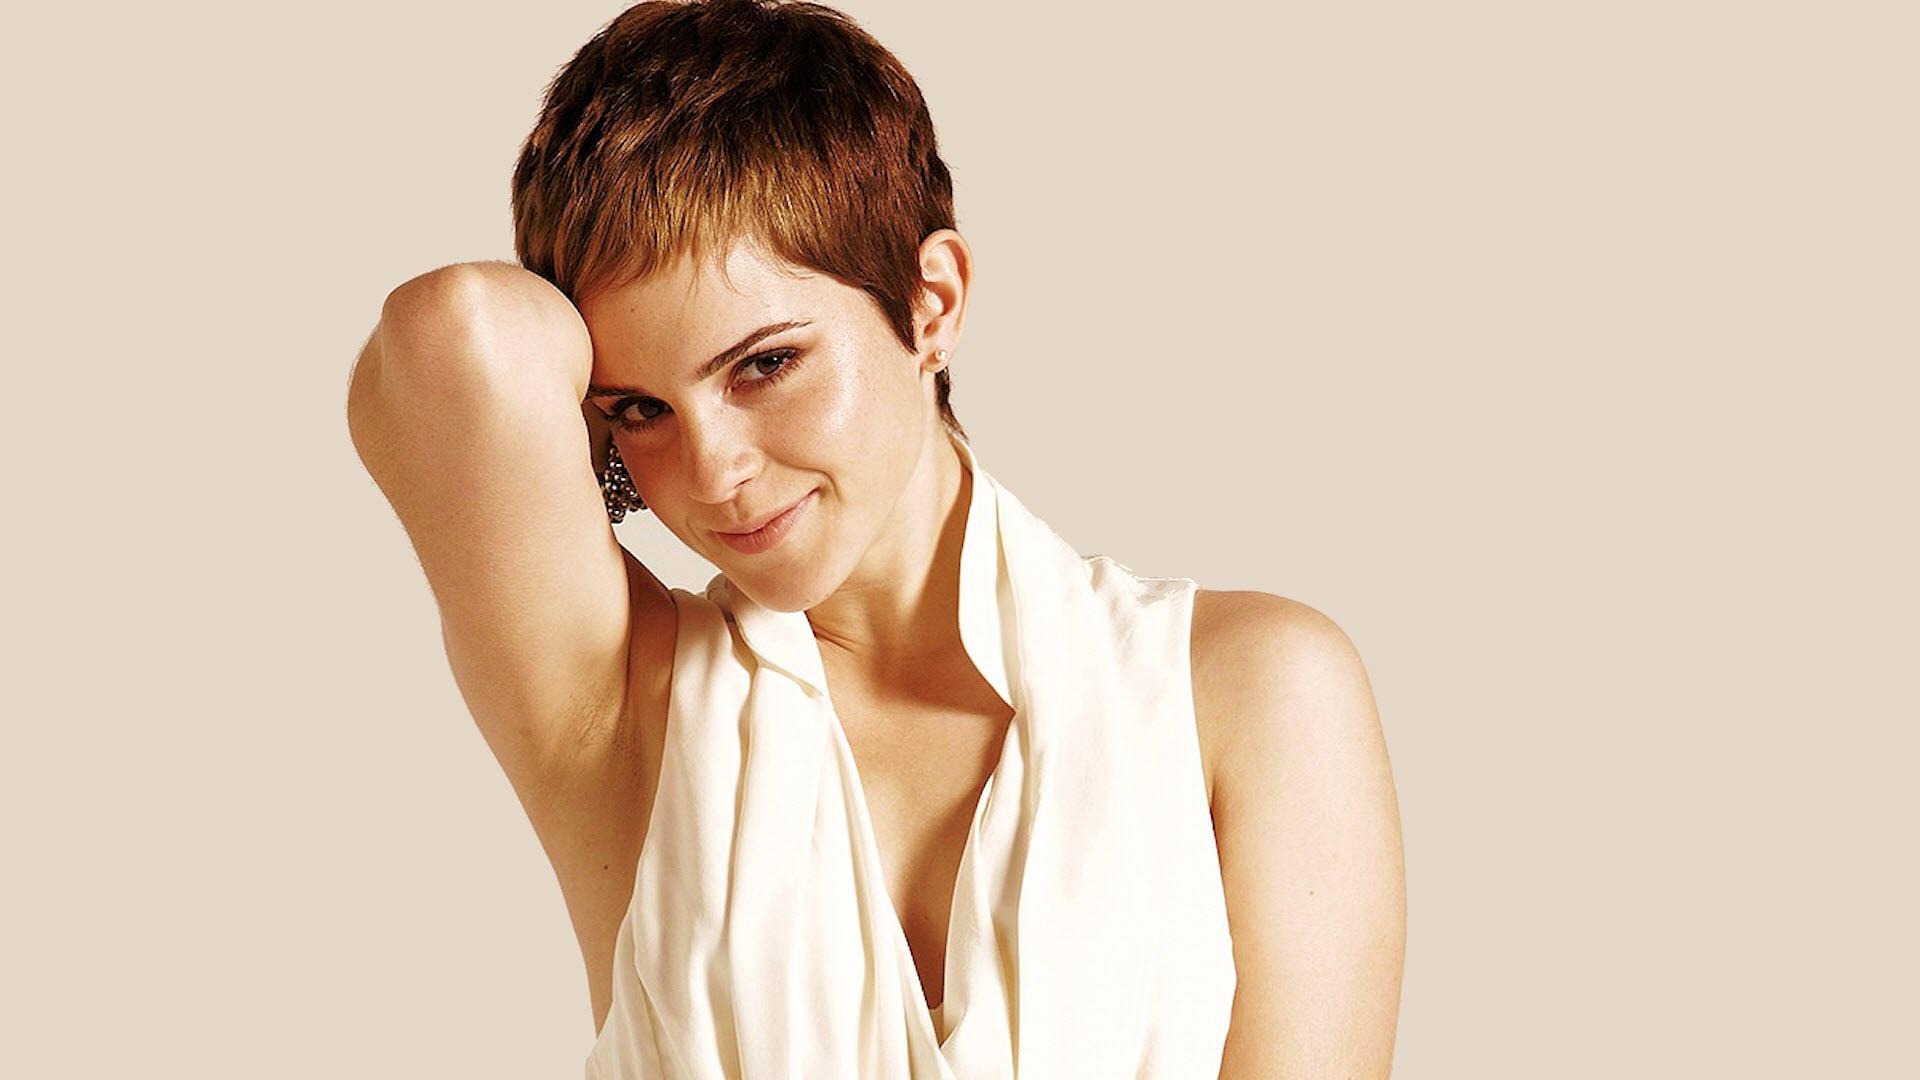 Emma Watson short Pixie Hair